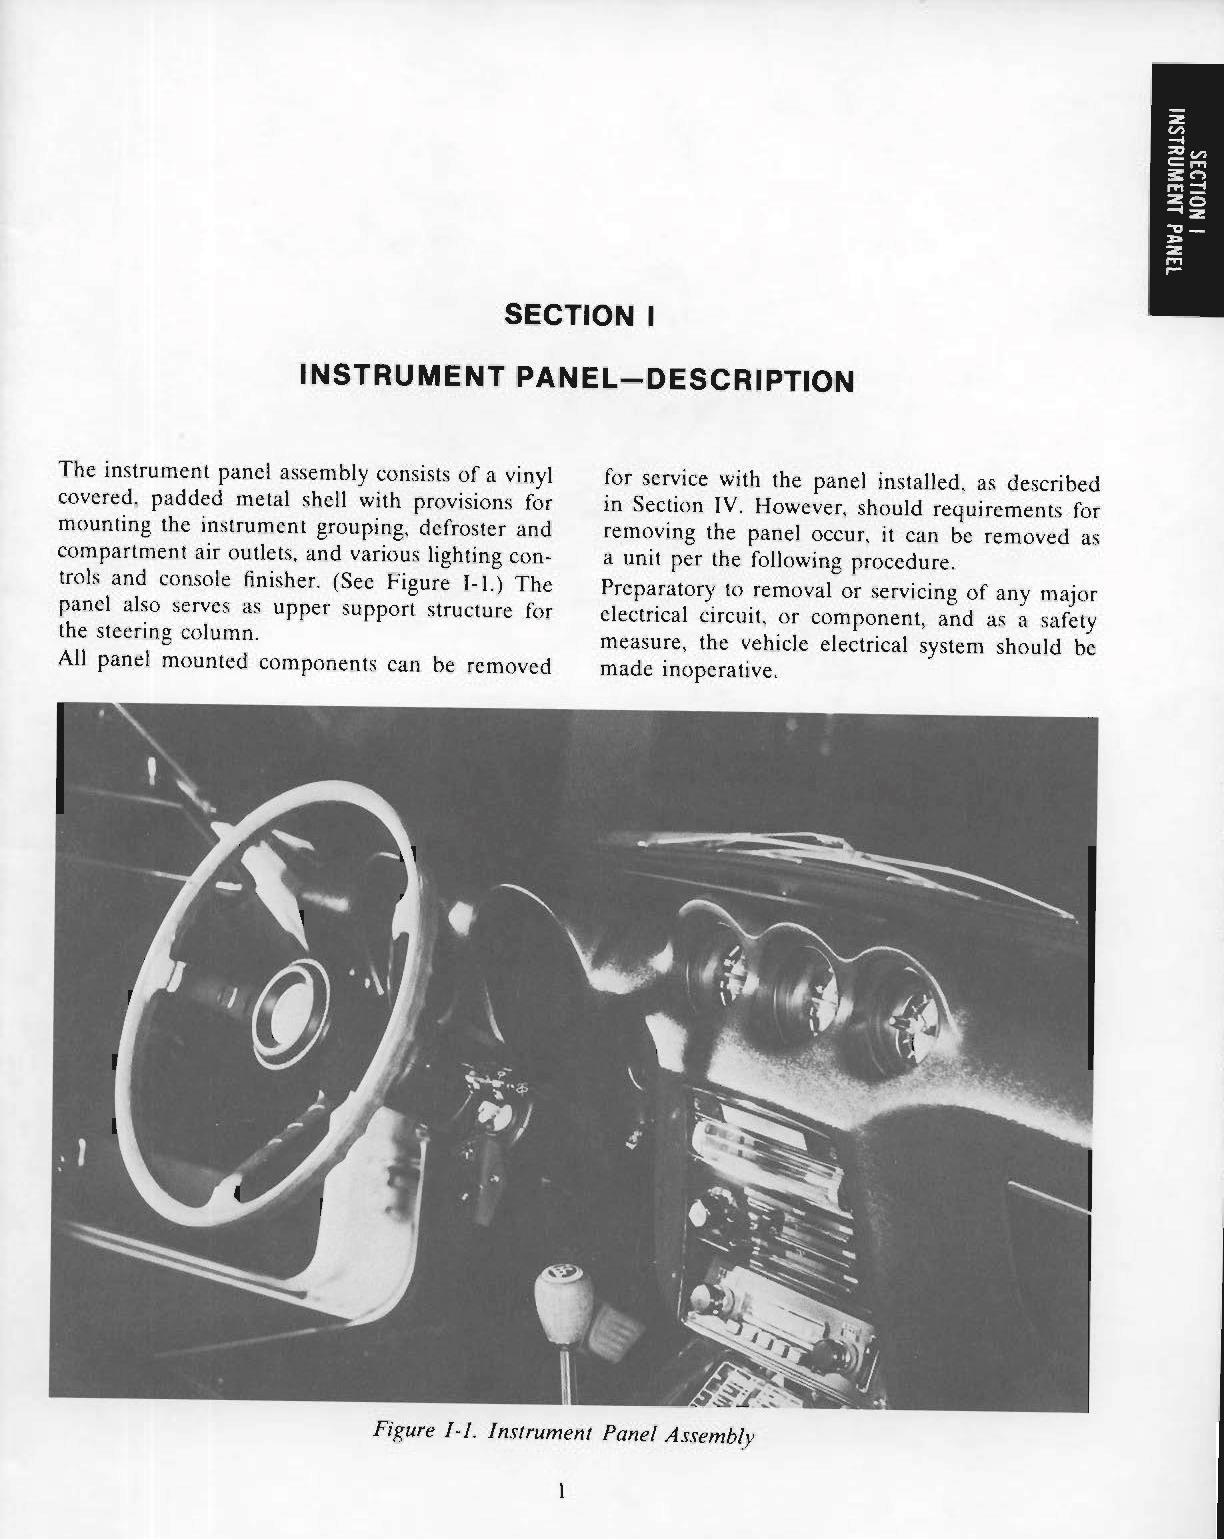 1971 240z wiring diagram 1971 corvette wiring diagram